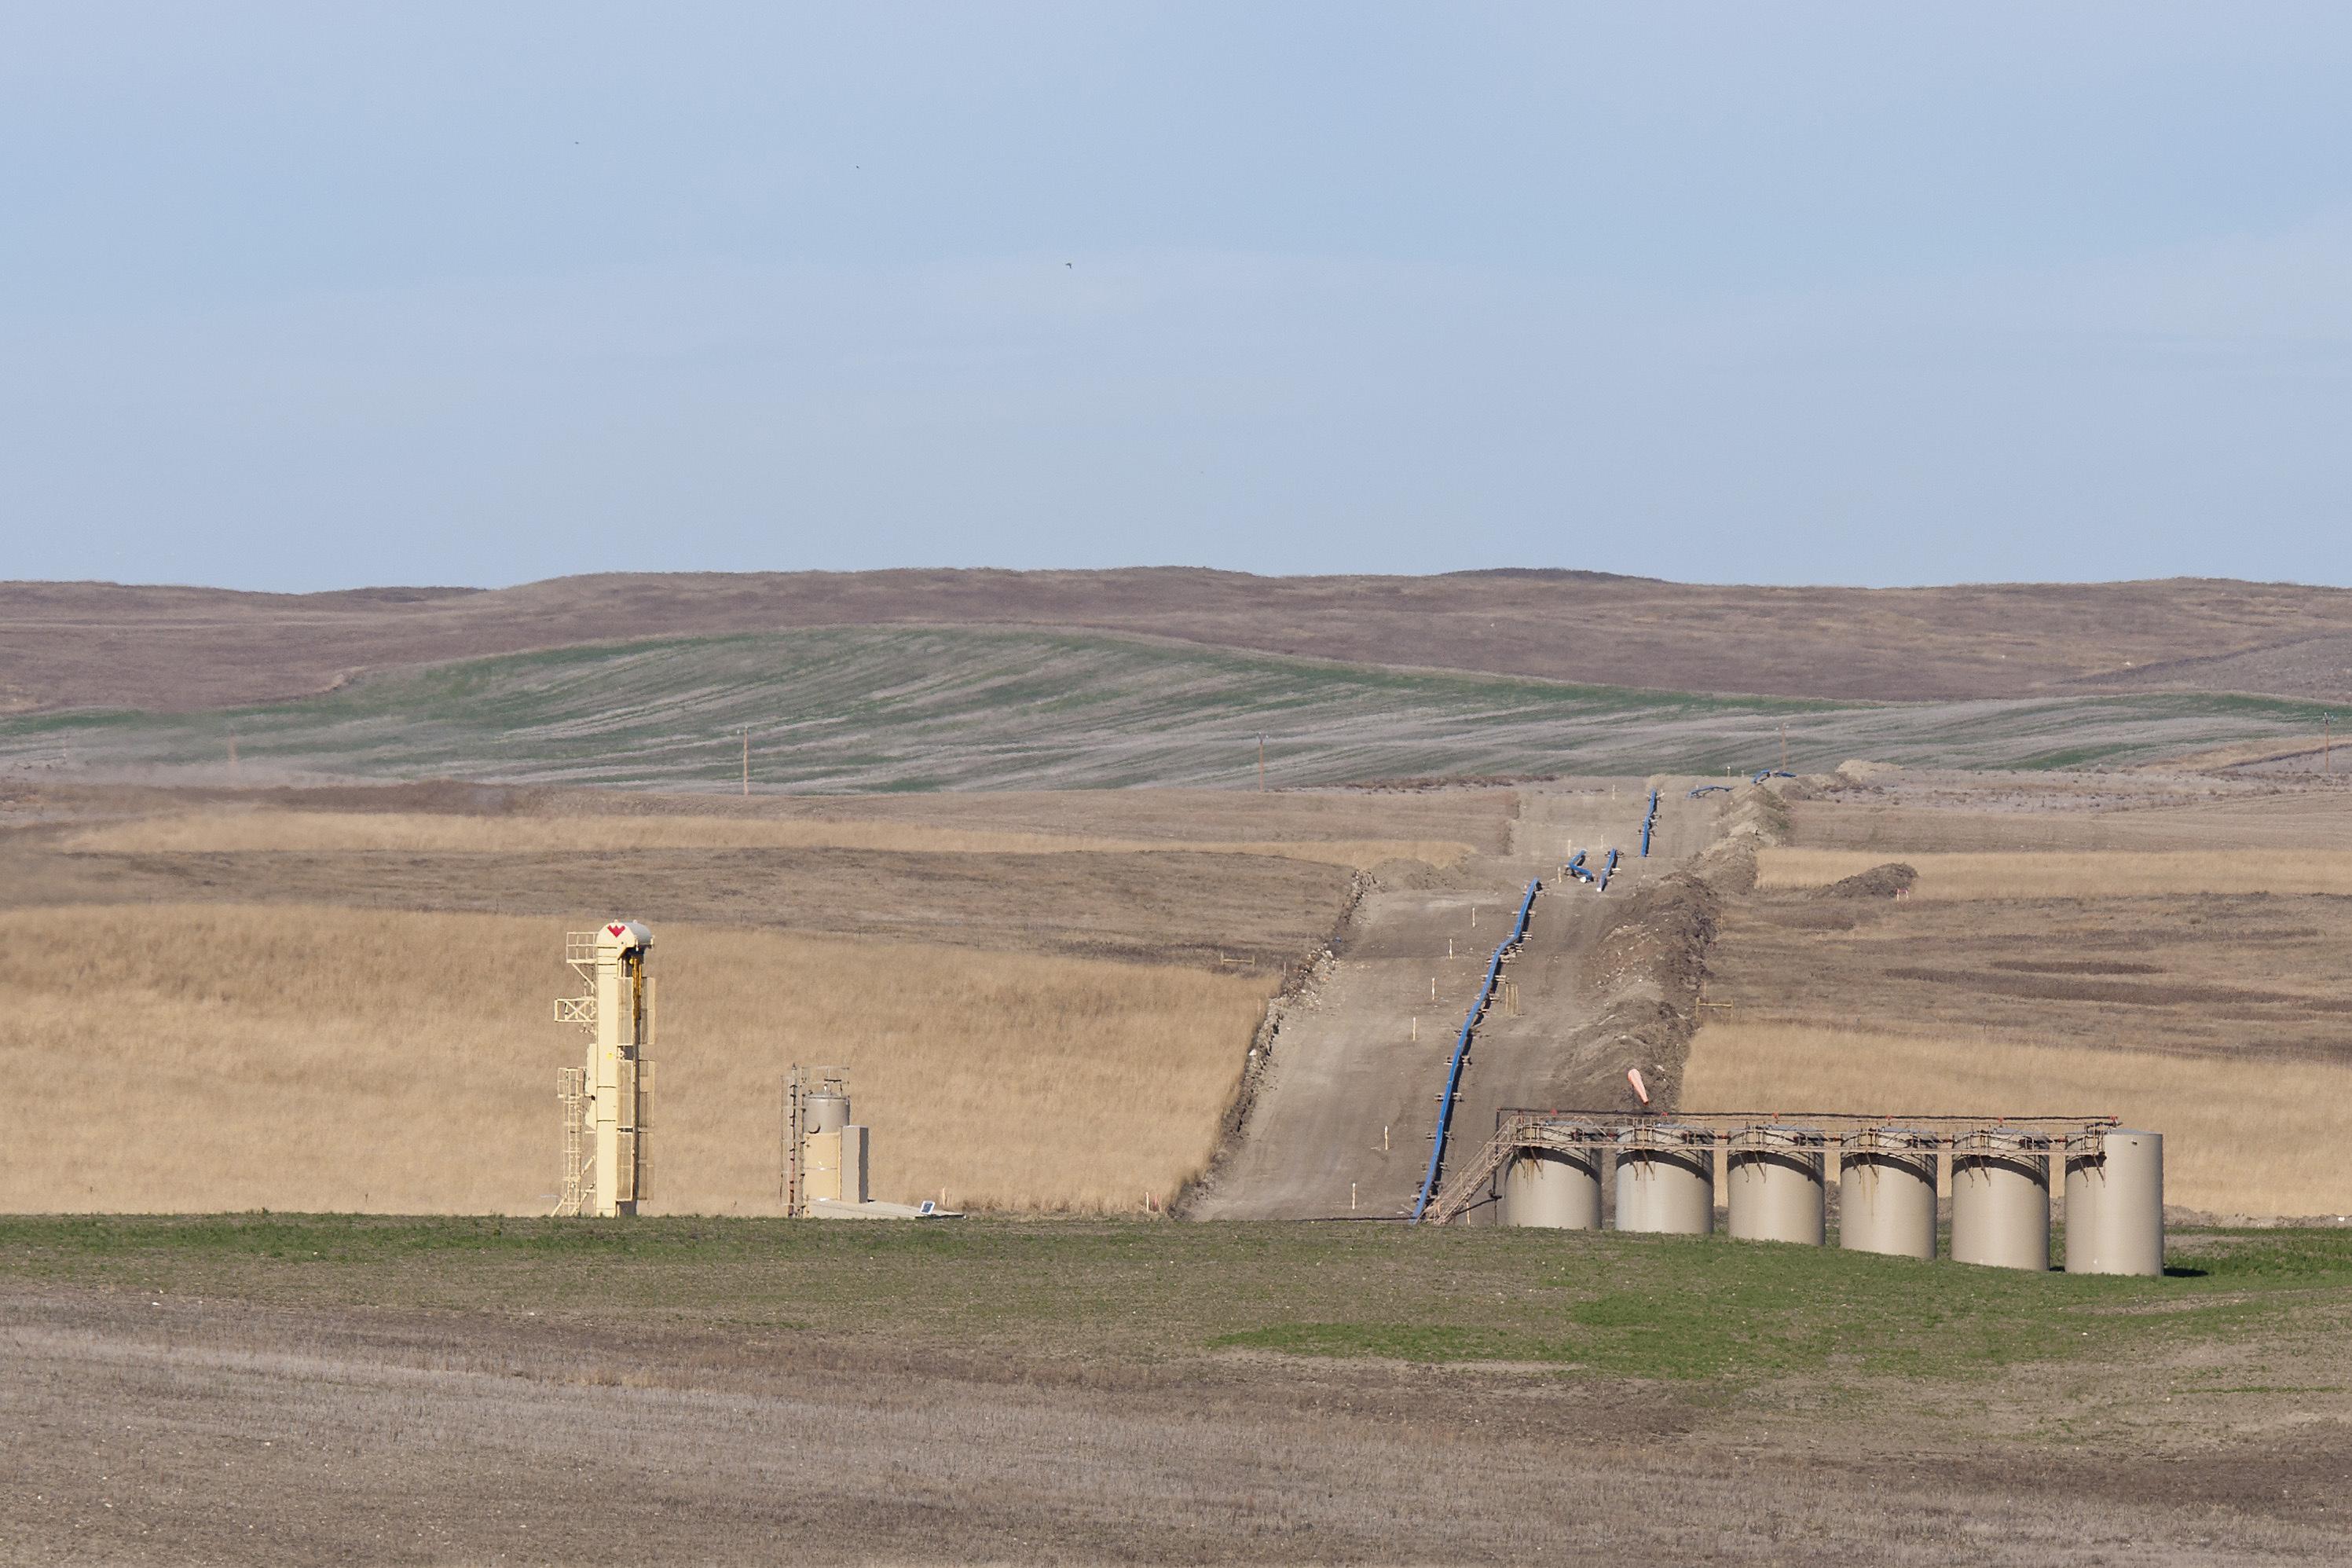 A pipeline under construction in North Dakota.